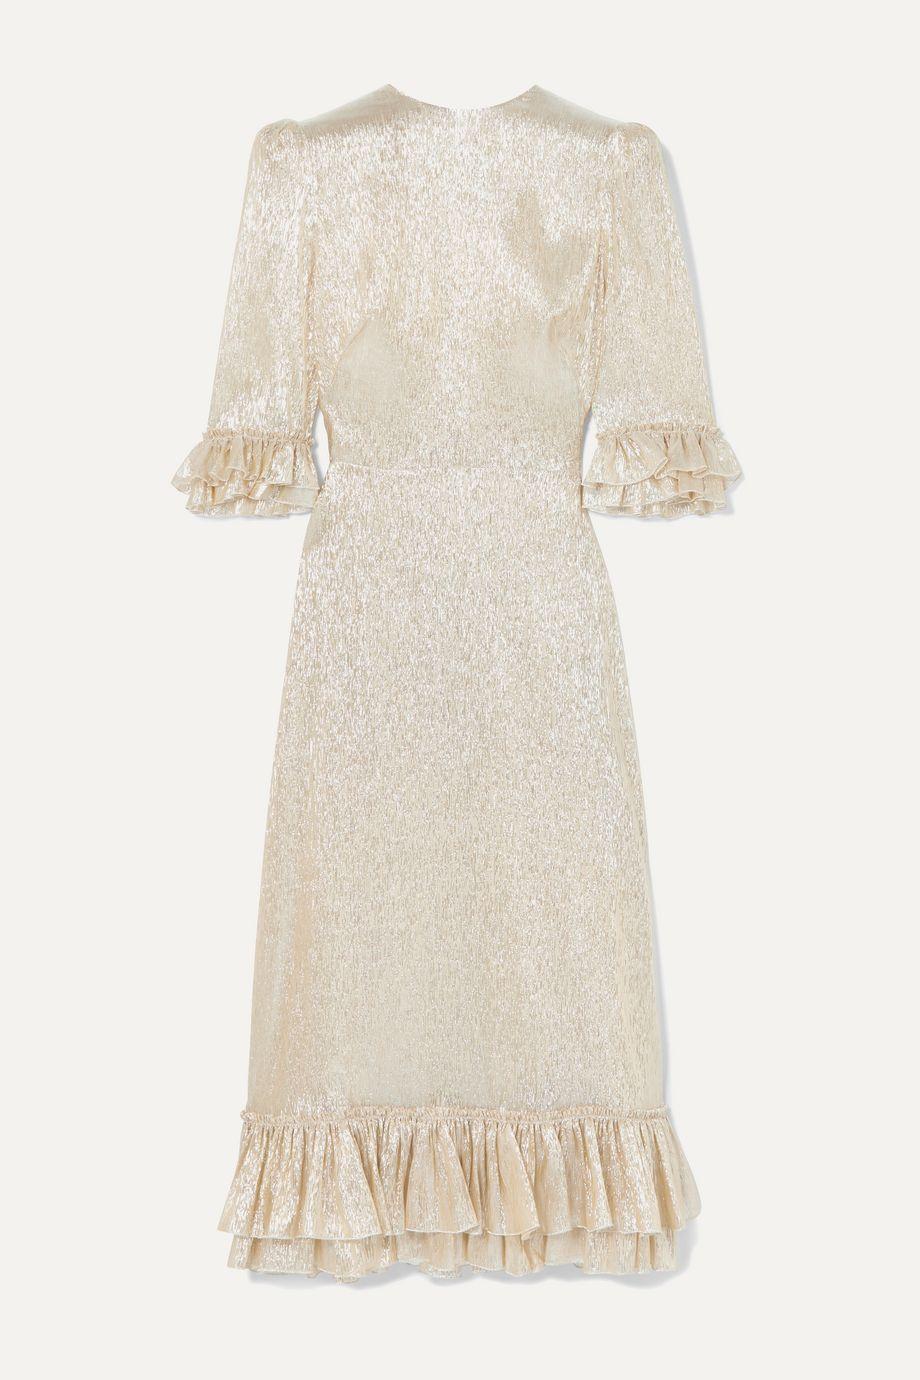 The Vampire's Wife Falconetti ruffled silk-blend lamé dress